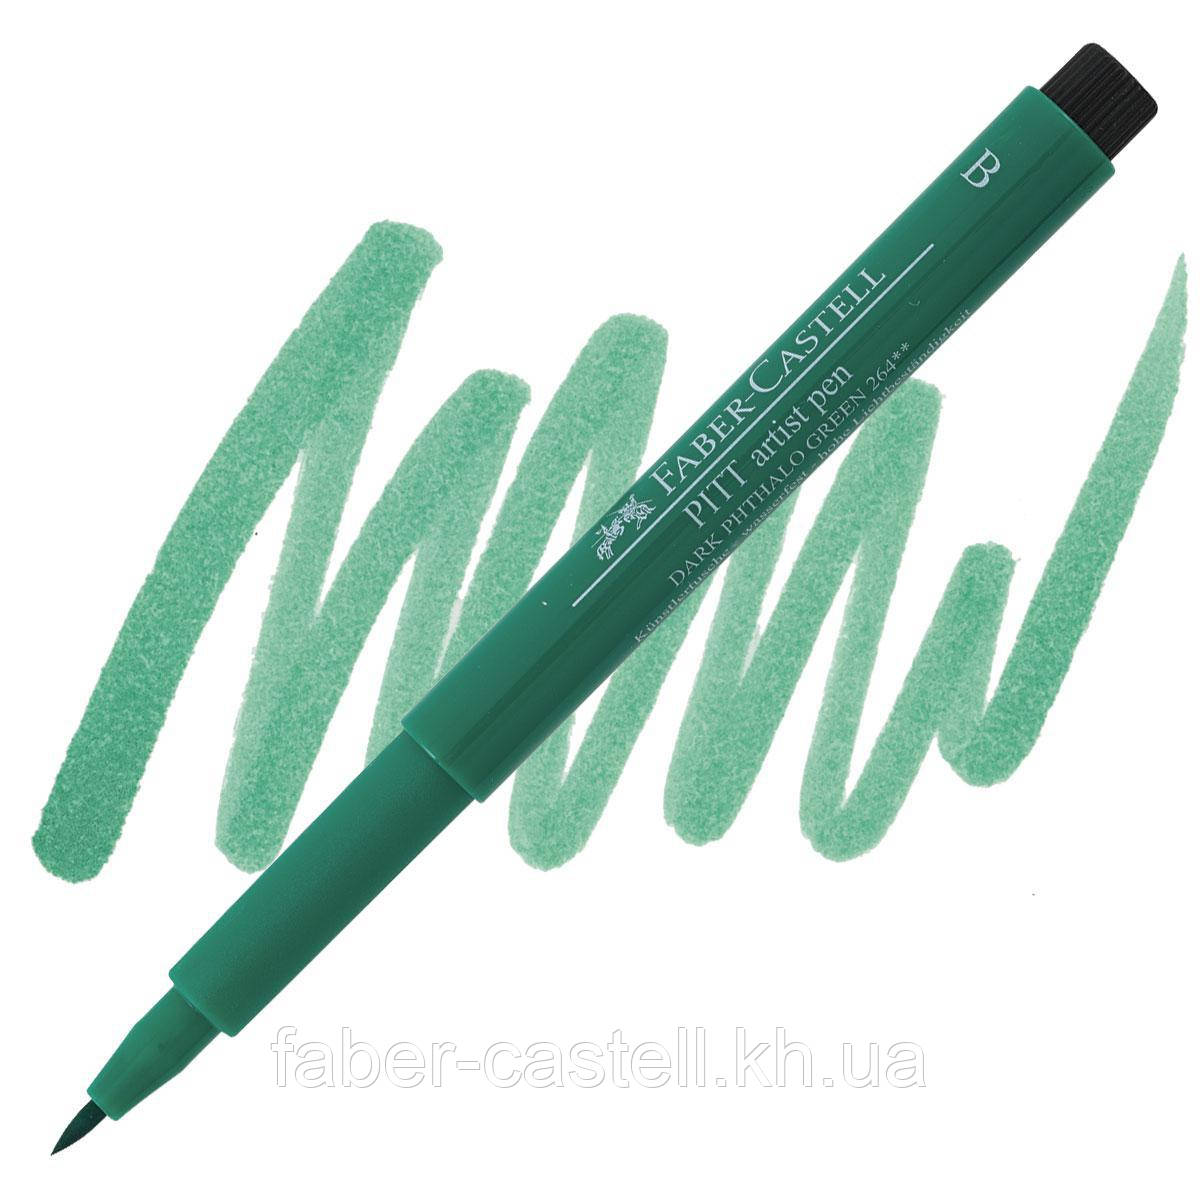 "Ручка-кисточка капиллярная Faber - Castell PITT® ARTIST PEN ""BRUSH"" № 264 темно-зеленый, 167478"